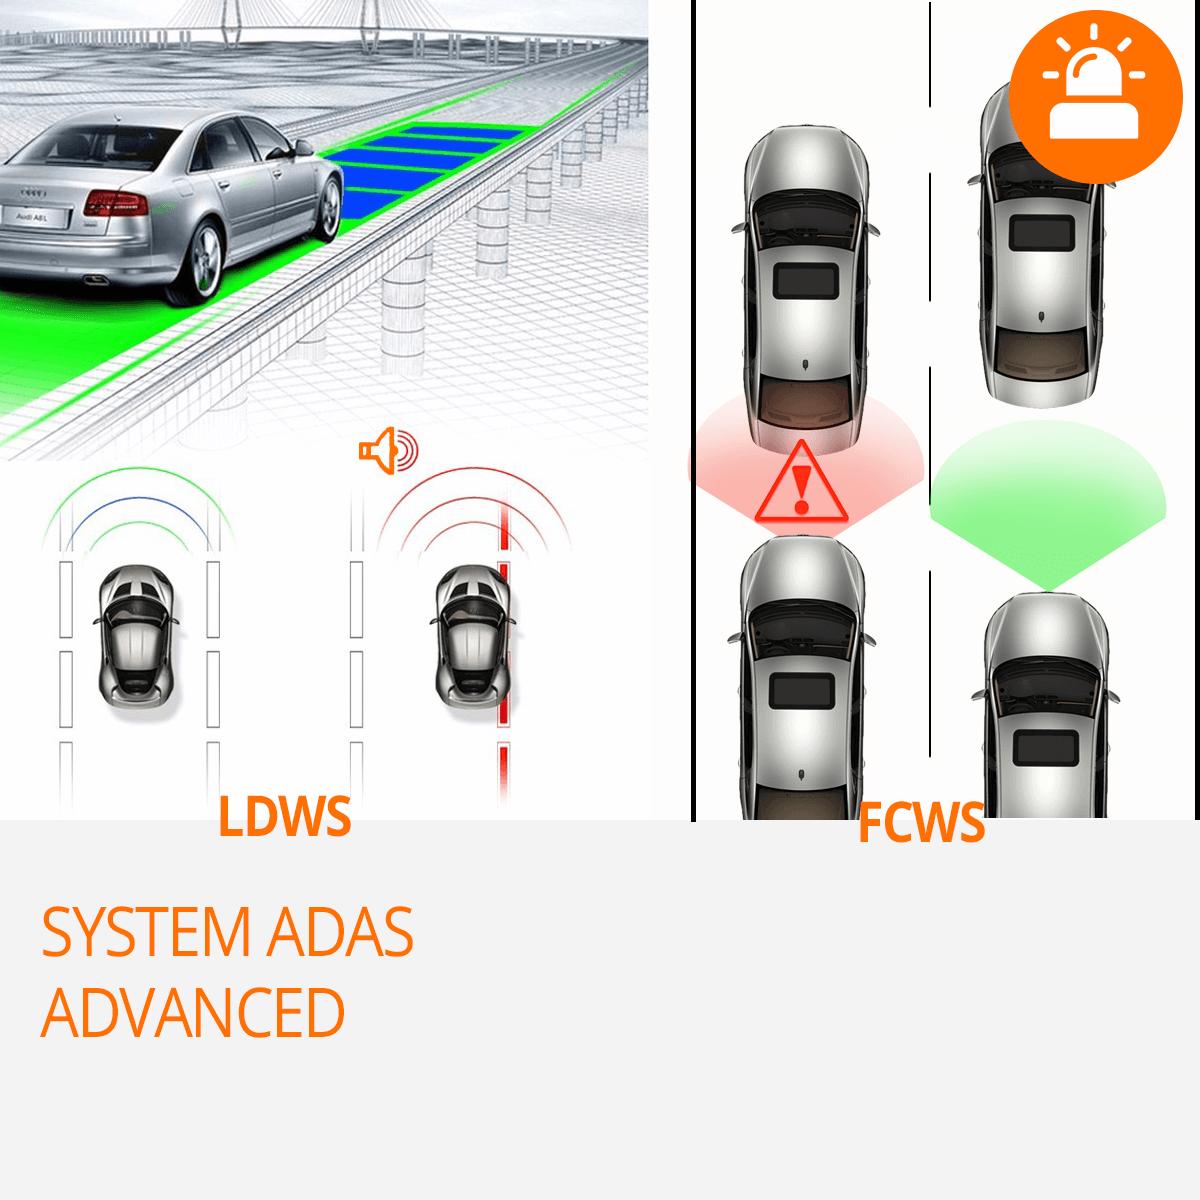 Kamera-samochodowa-system-adas-advenced-orllo-pl